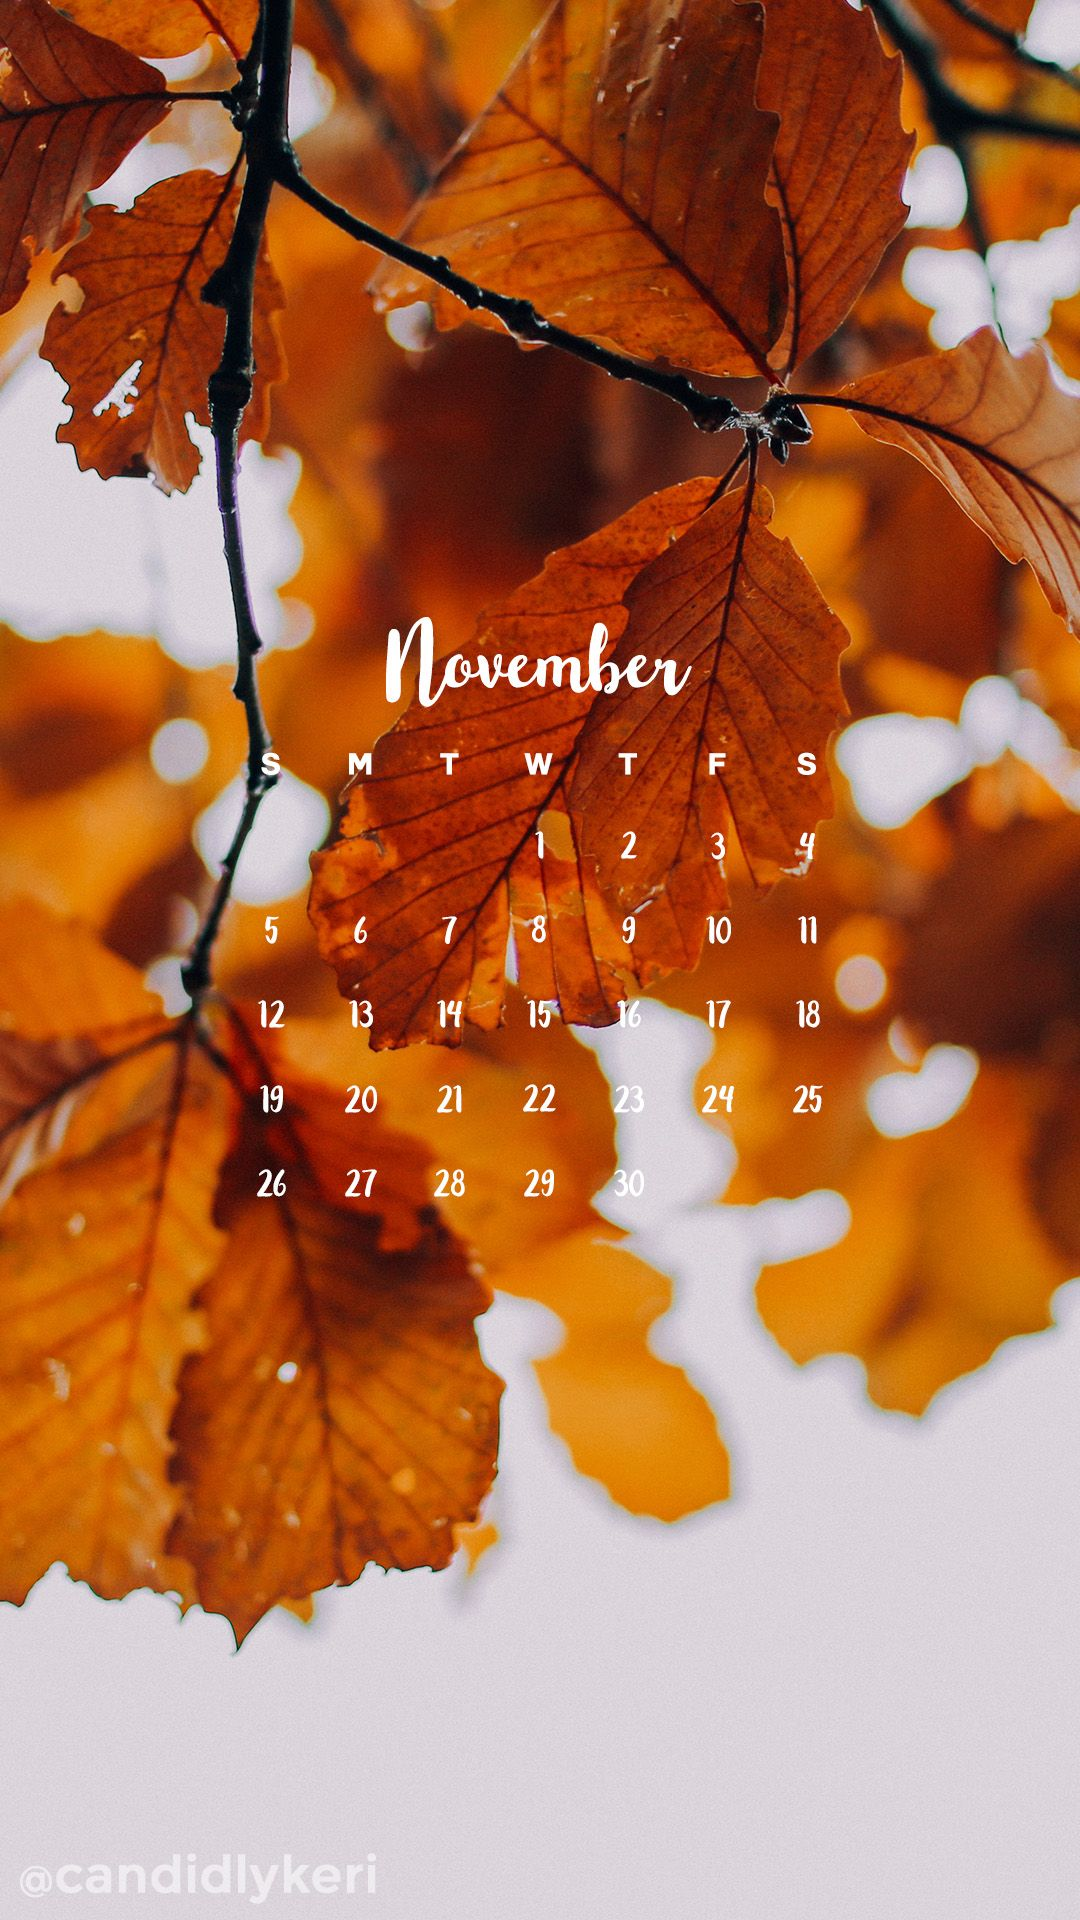 Golden changing fall leaves November calendar 2017